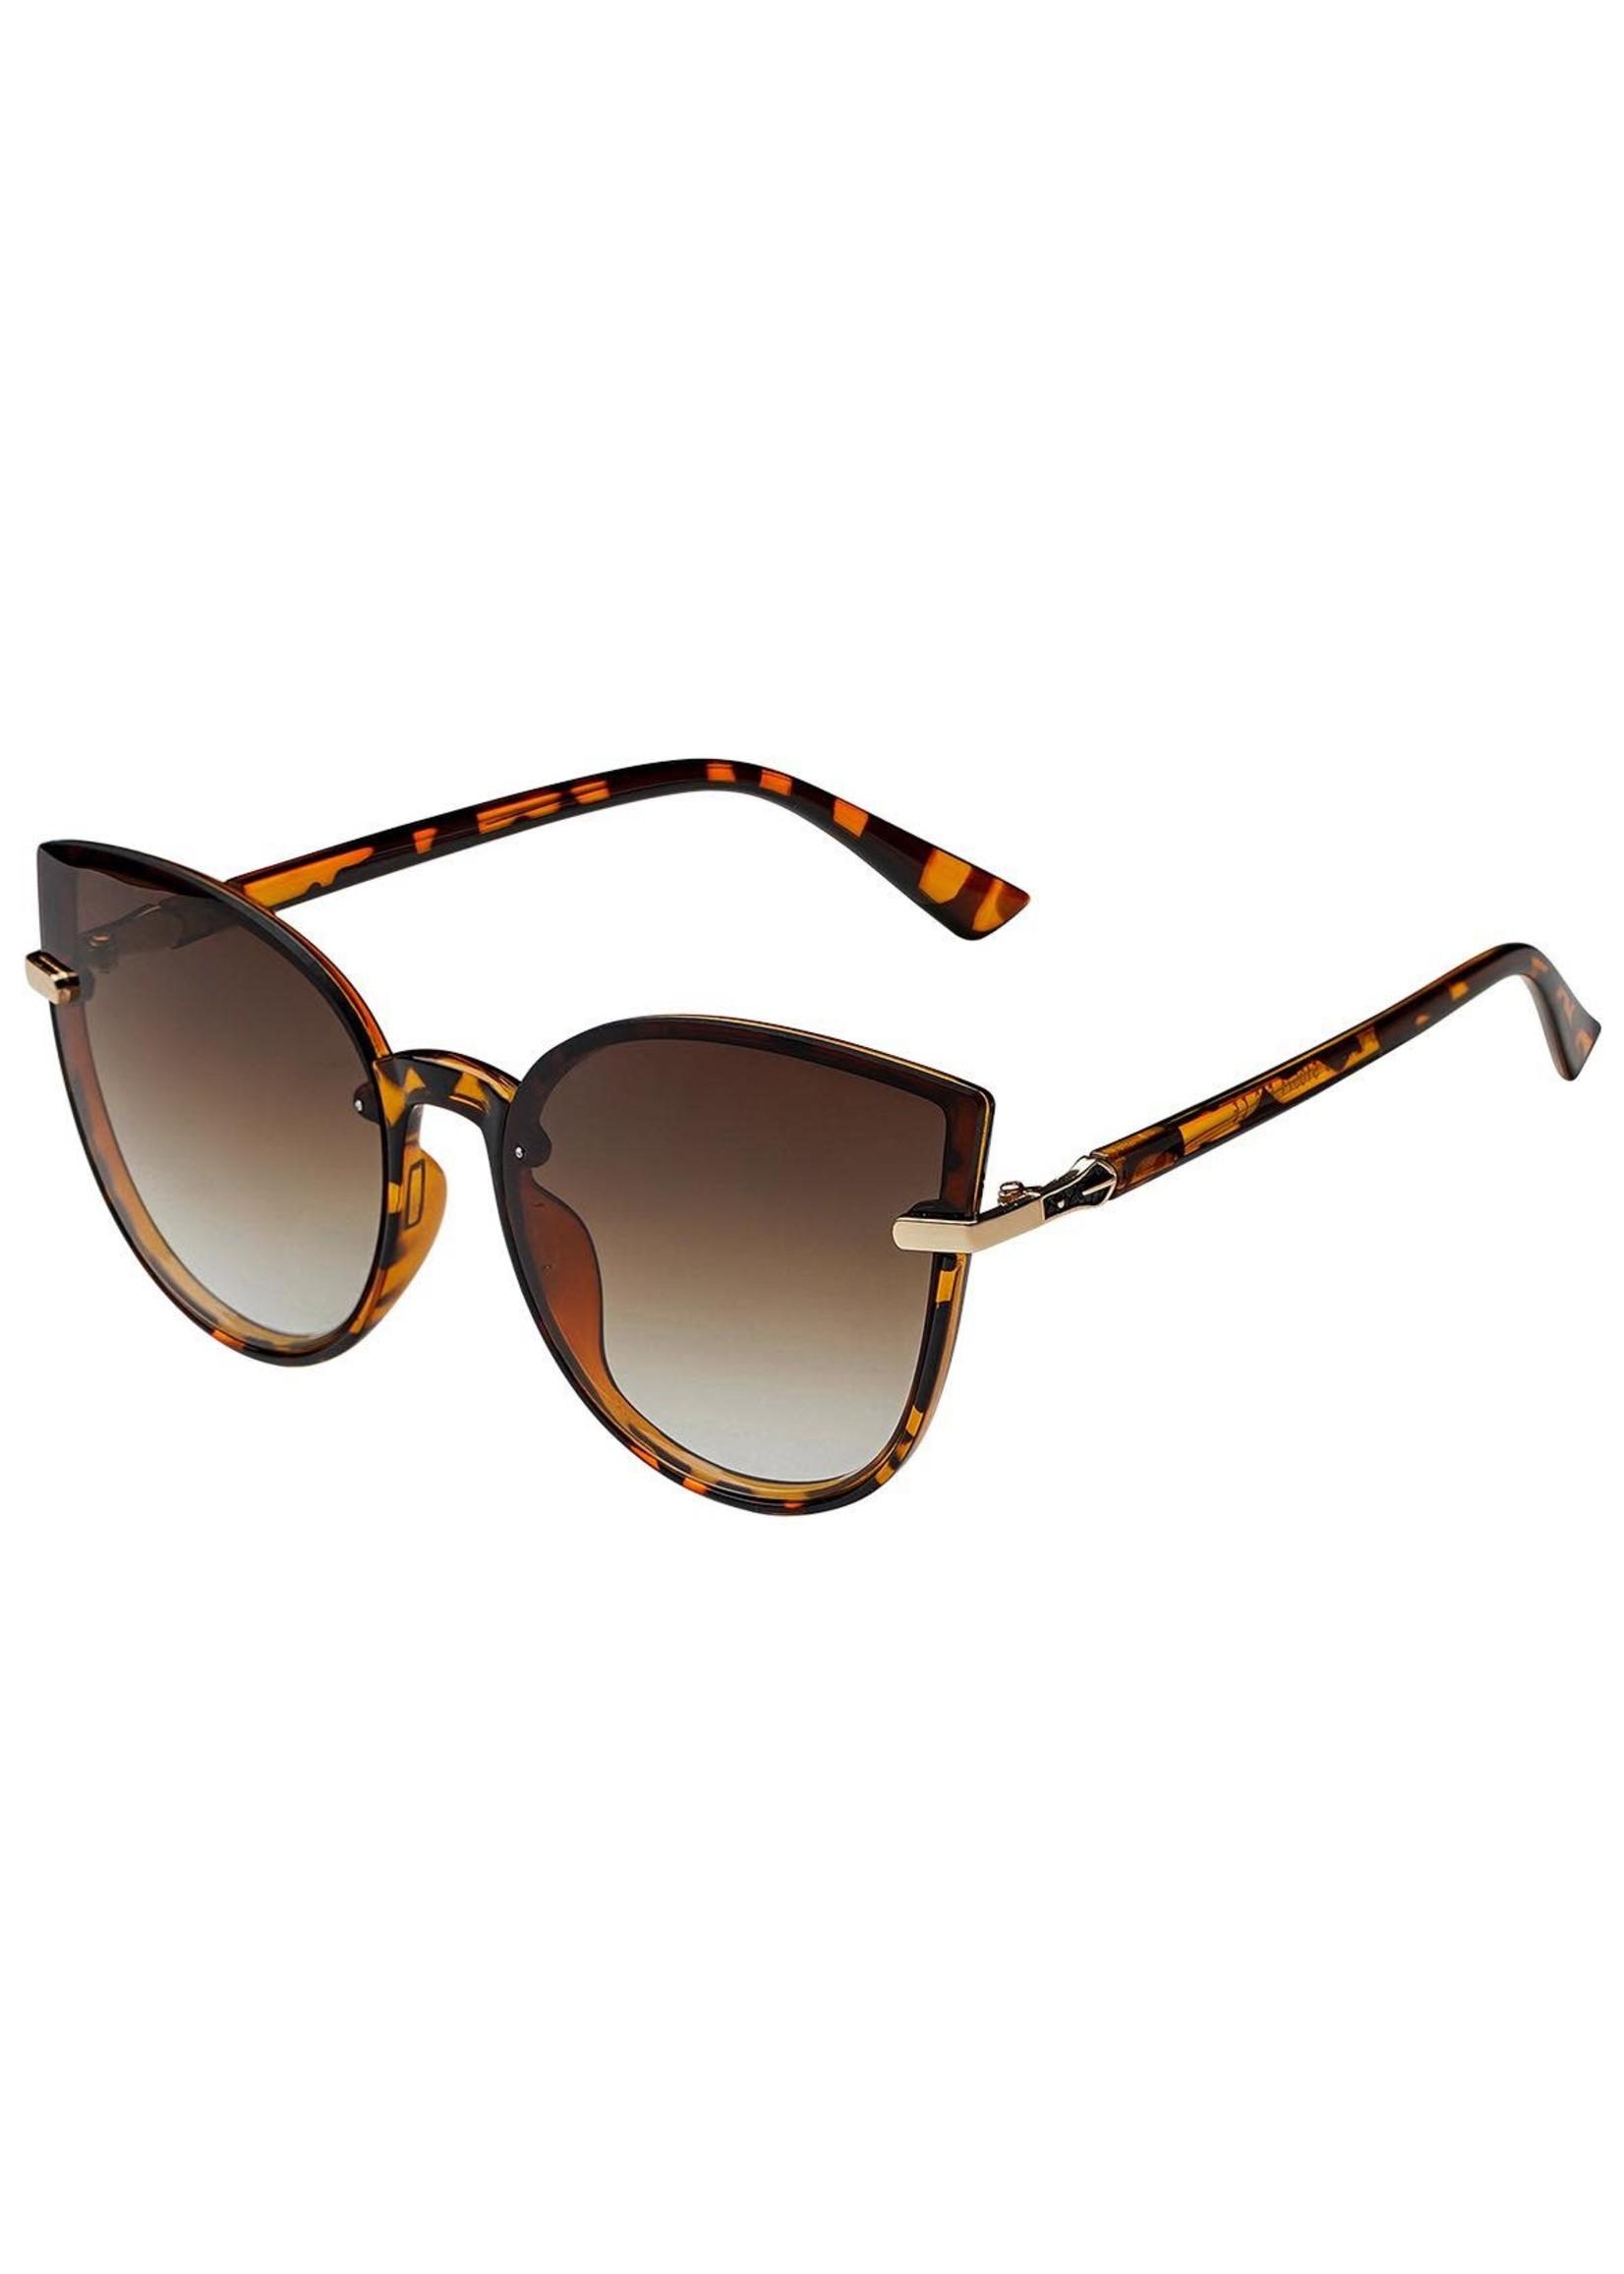 Barcelona Sunglasses Leopard